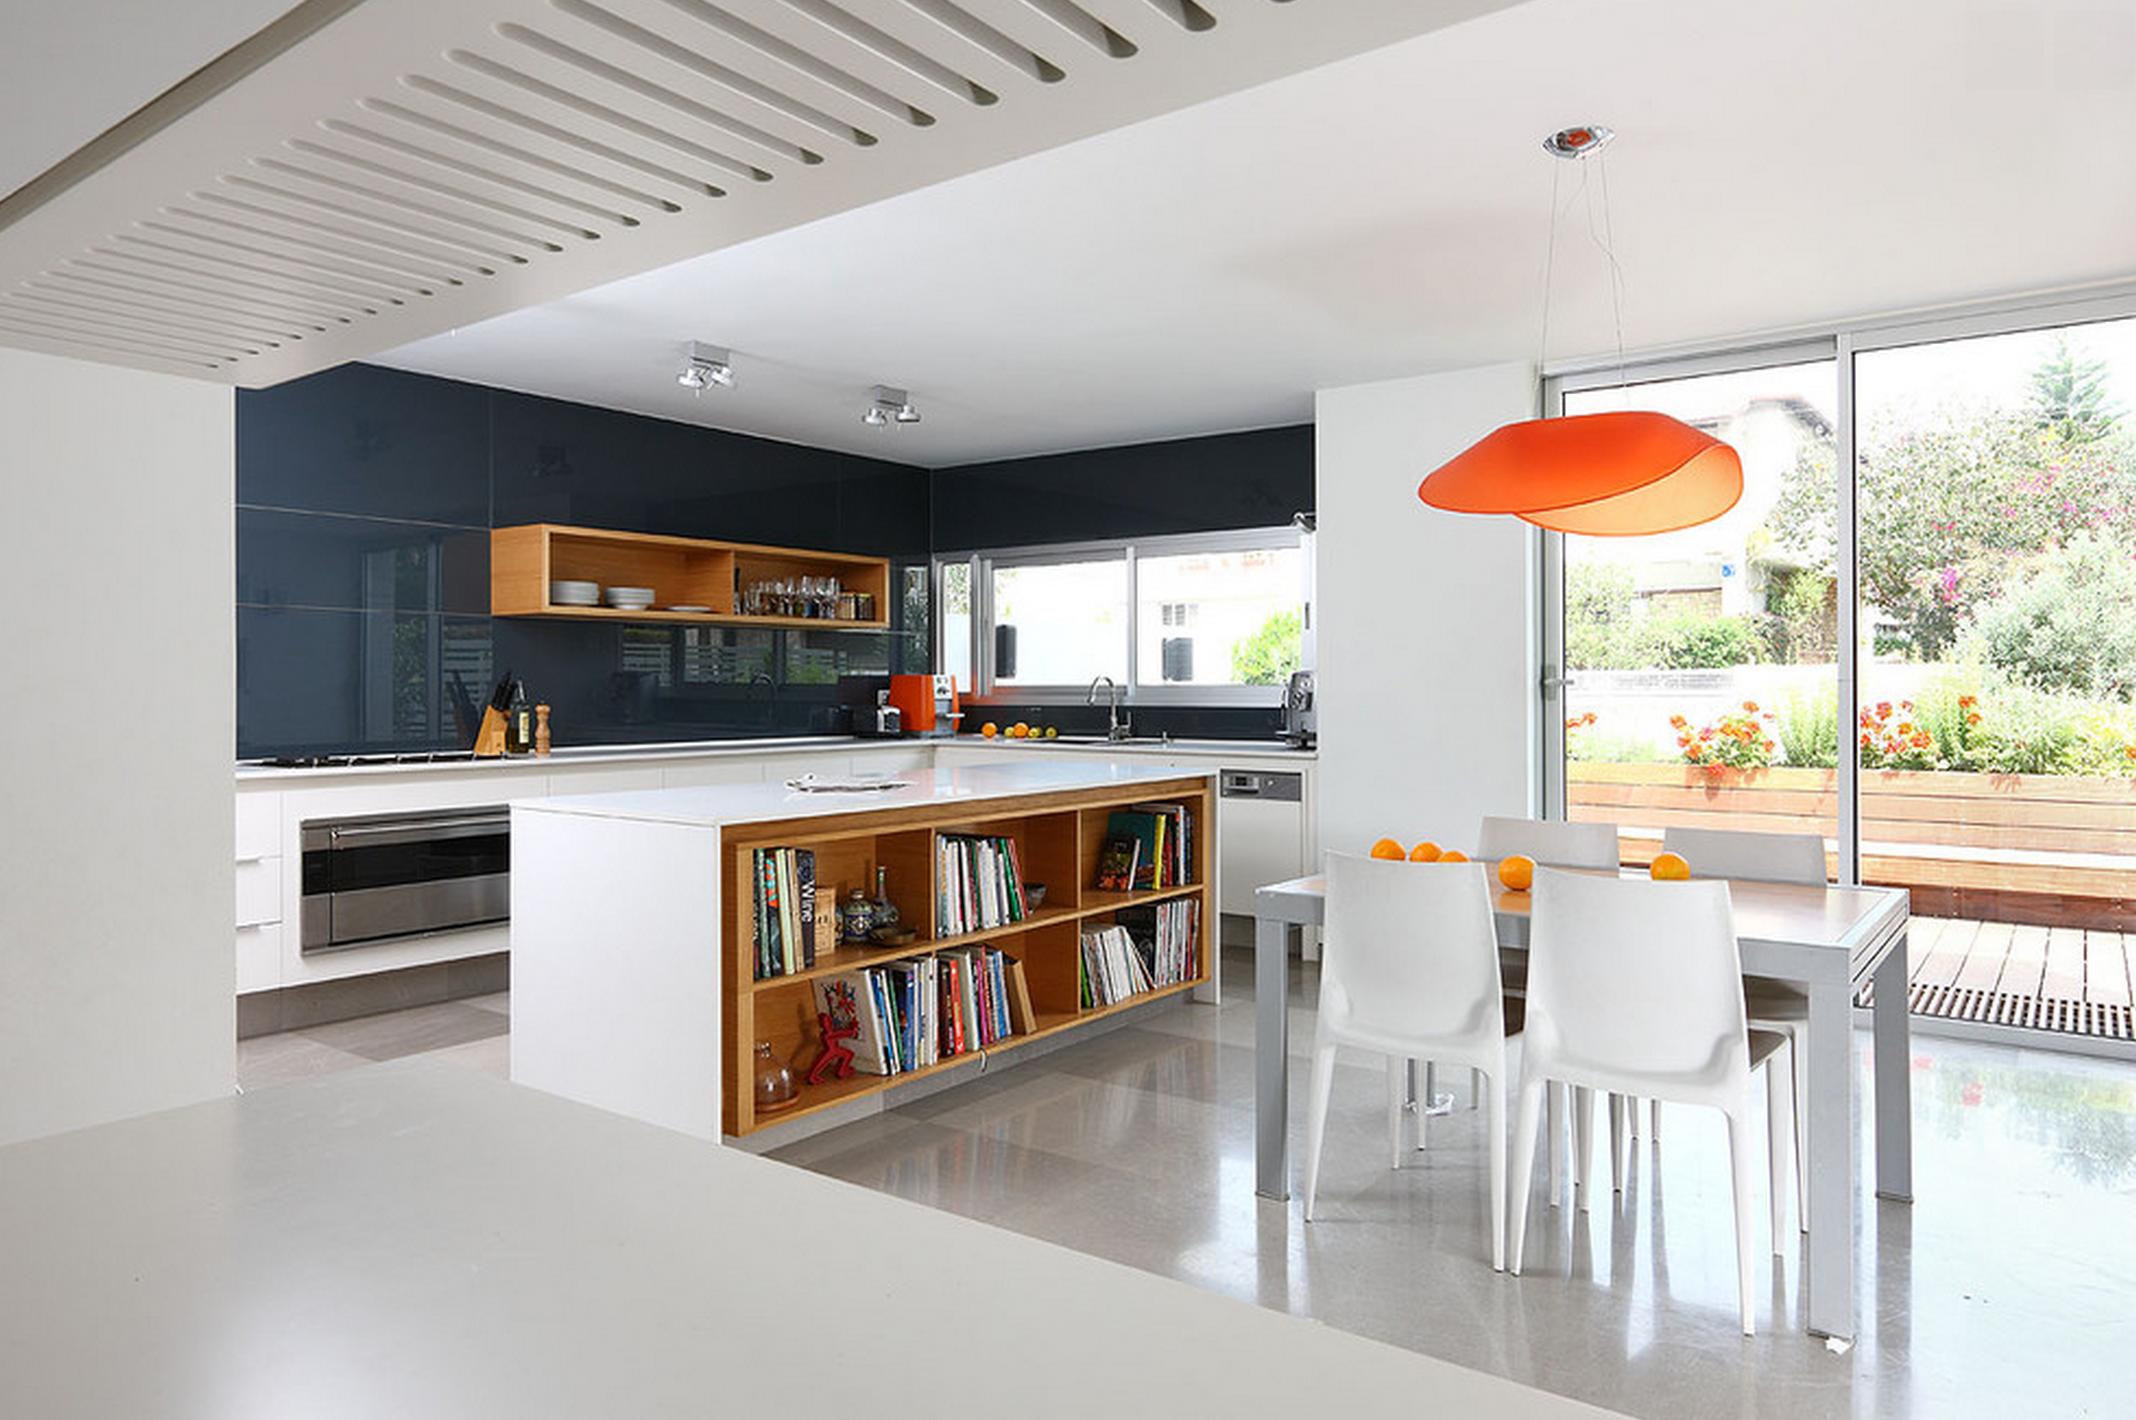 White Kitchen Orange Accents modern kitchen with open shelves, petrol blue splashback and white